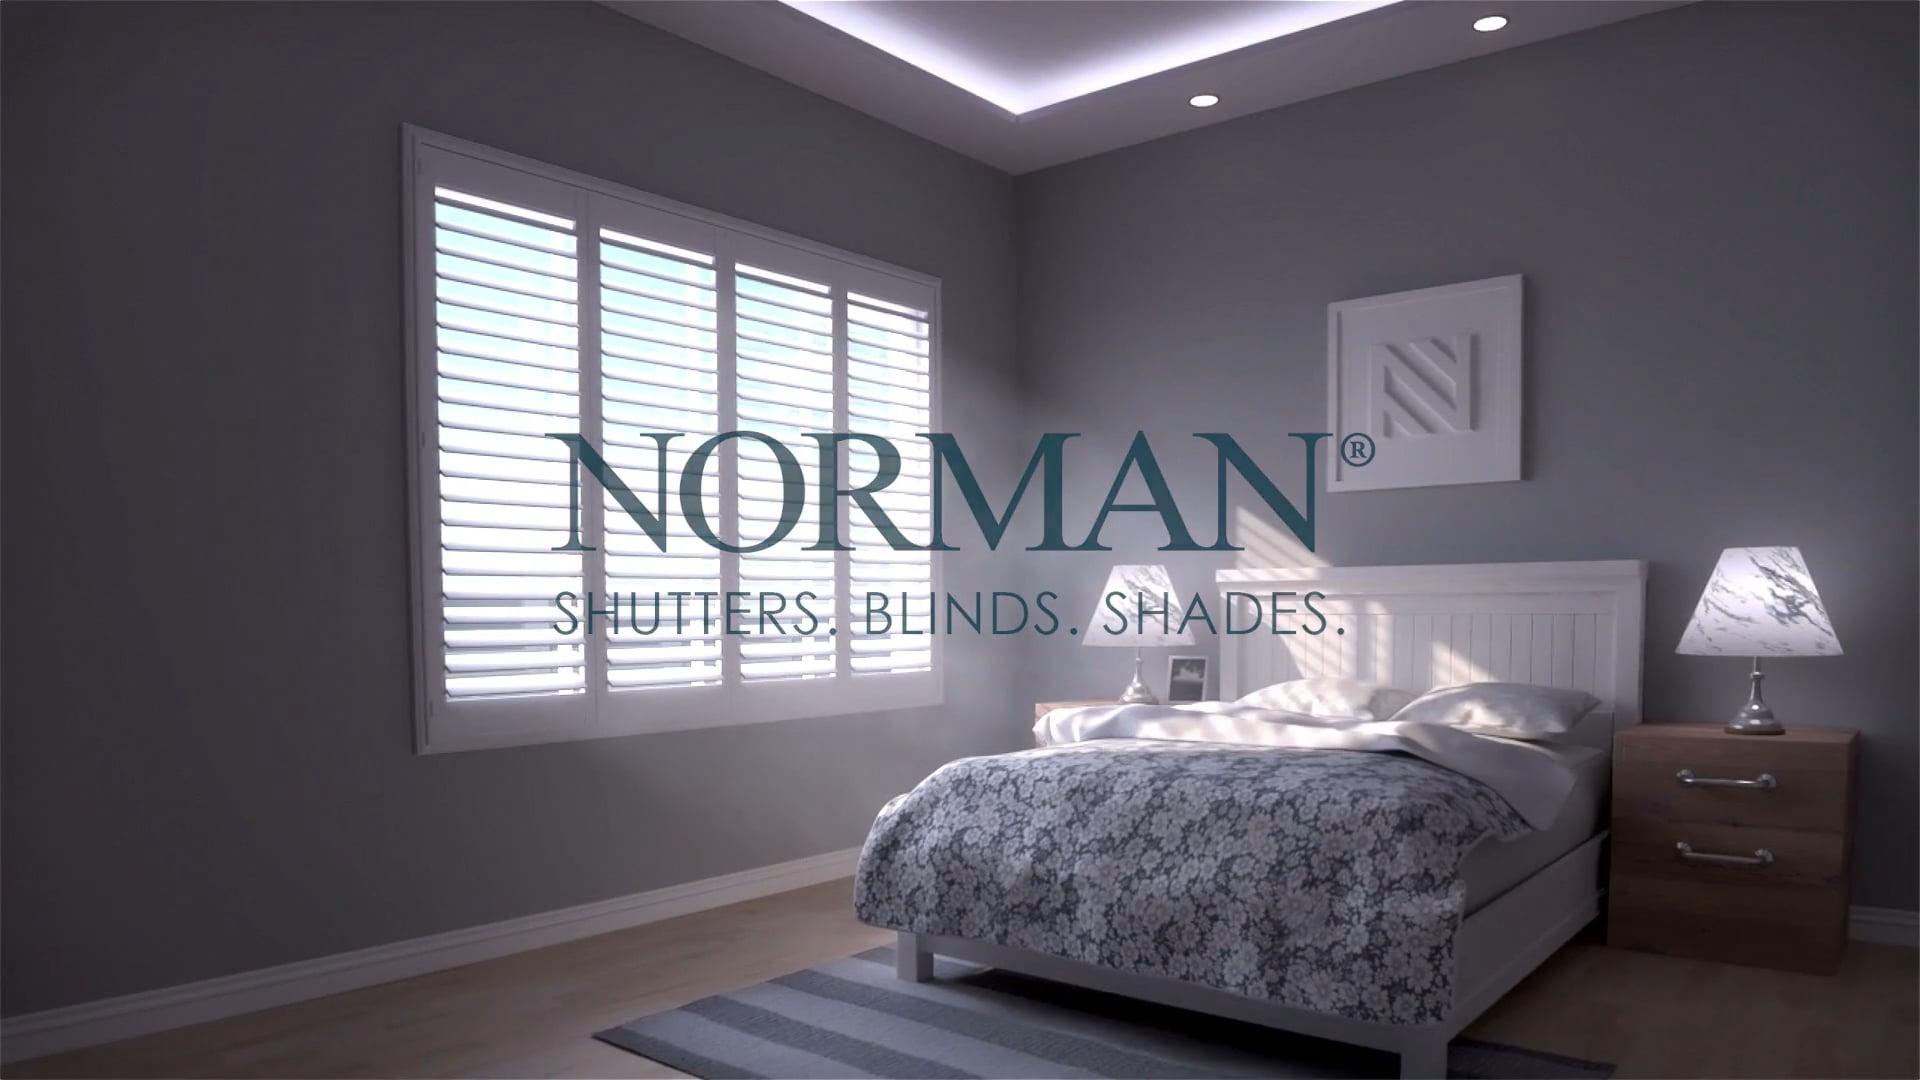 Norman® DayNite™ Shutters